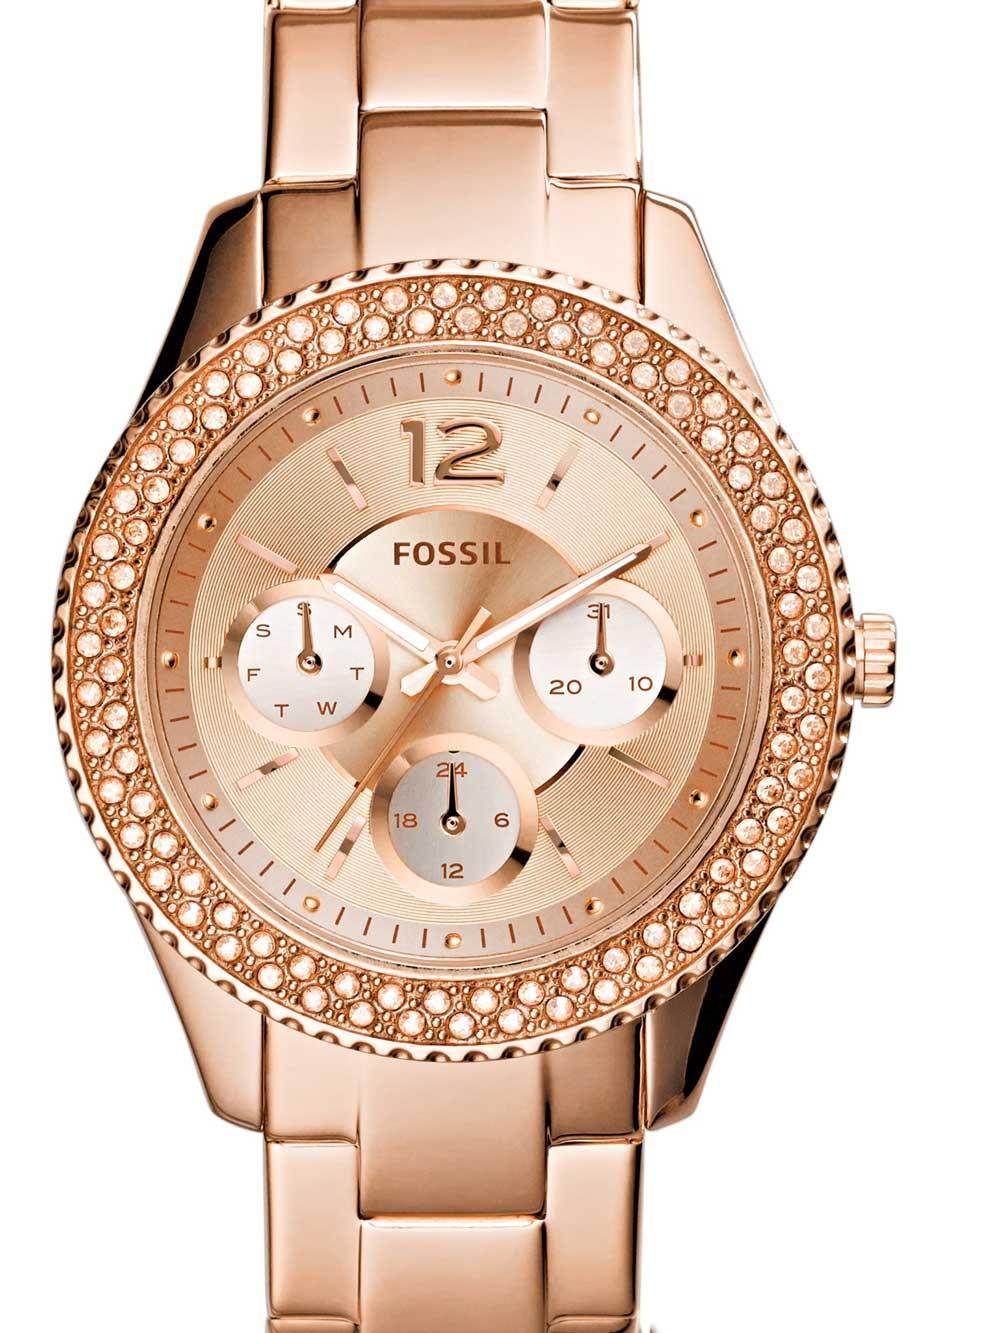 watches chrono12 fossil es3590 stella damen 38mm 5atm. Black Bedroom Furniture Sets. Home Design Ideas